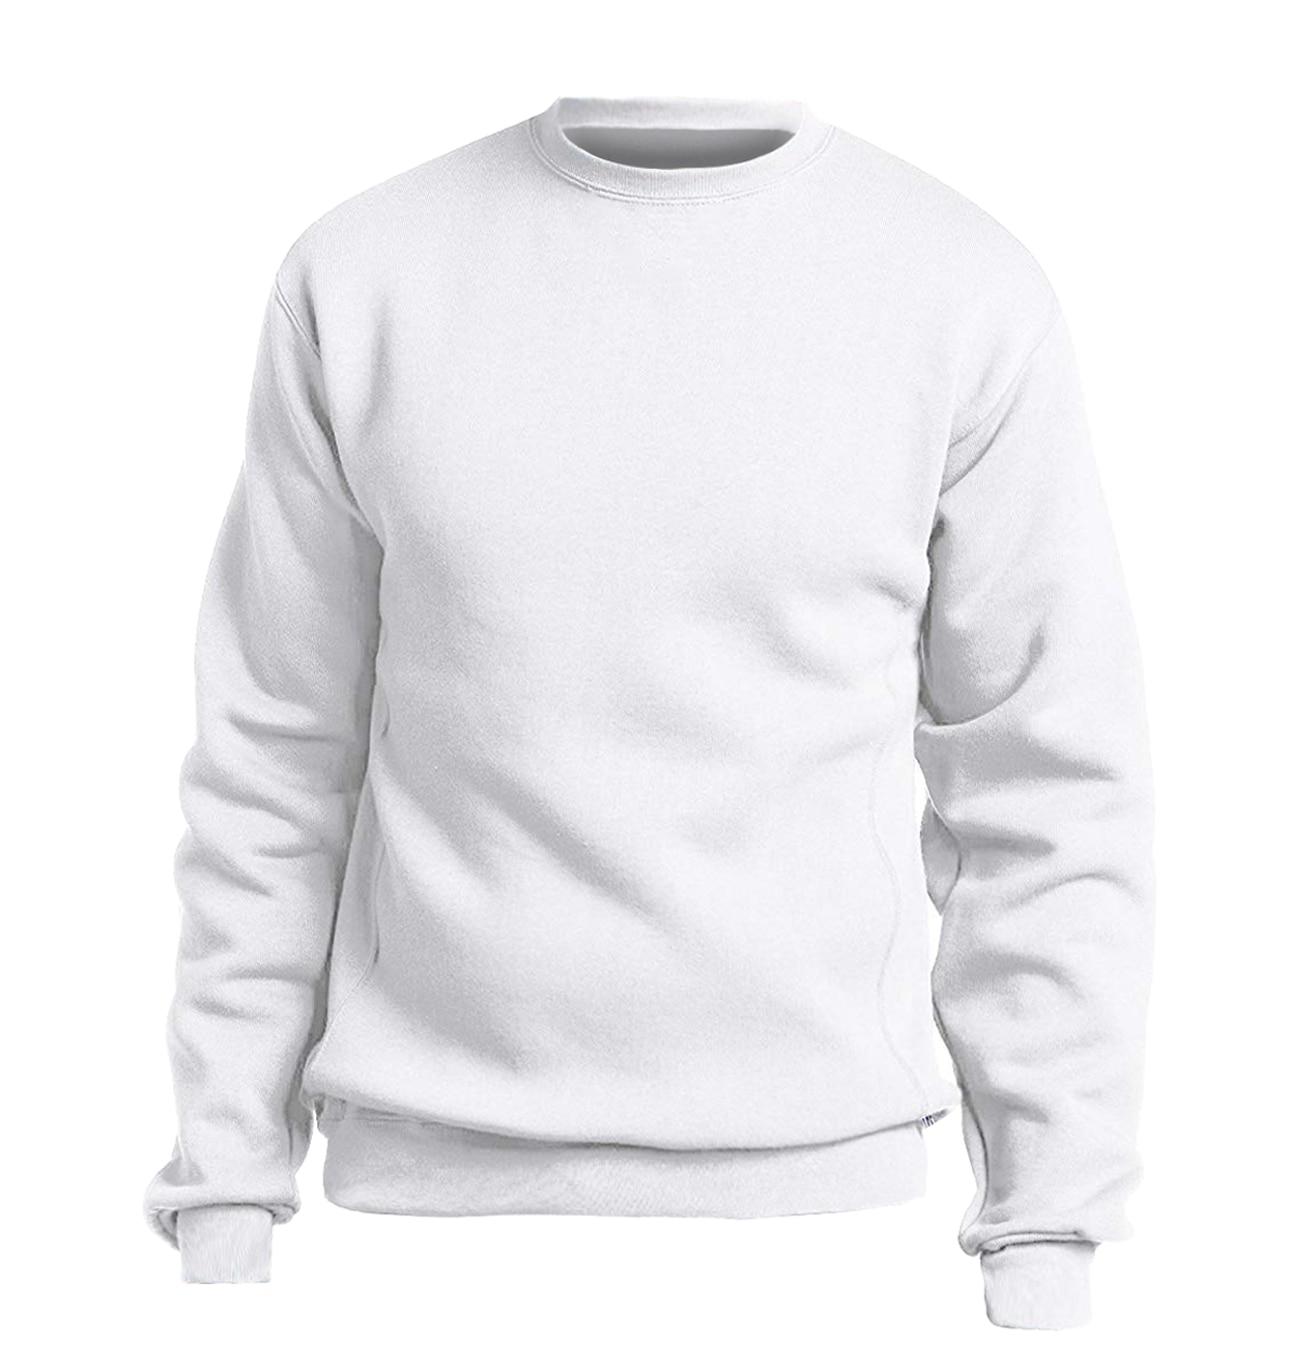 Solid color Sweatshirt Men Hoodie Crewneck Sweatshirts Winter Autumn Fleece Hoody Casual Gray Blue Red Black White Streetwear 6